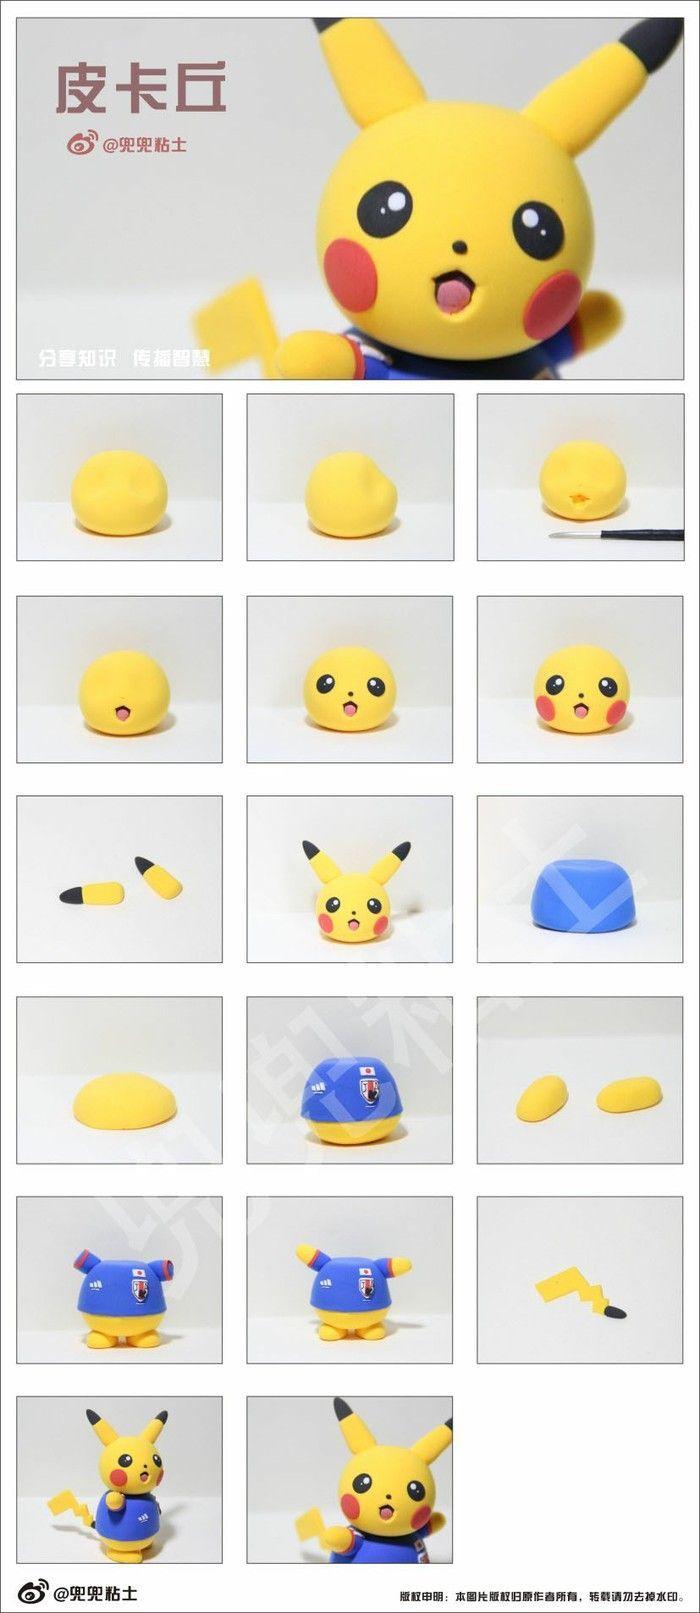 Extrêmement Pin on Clay | Pinterest | Pokémon, Clay and Polymers HL66